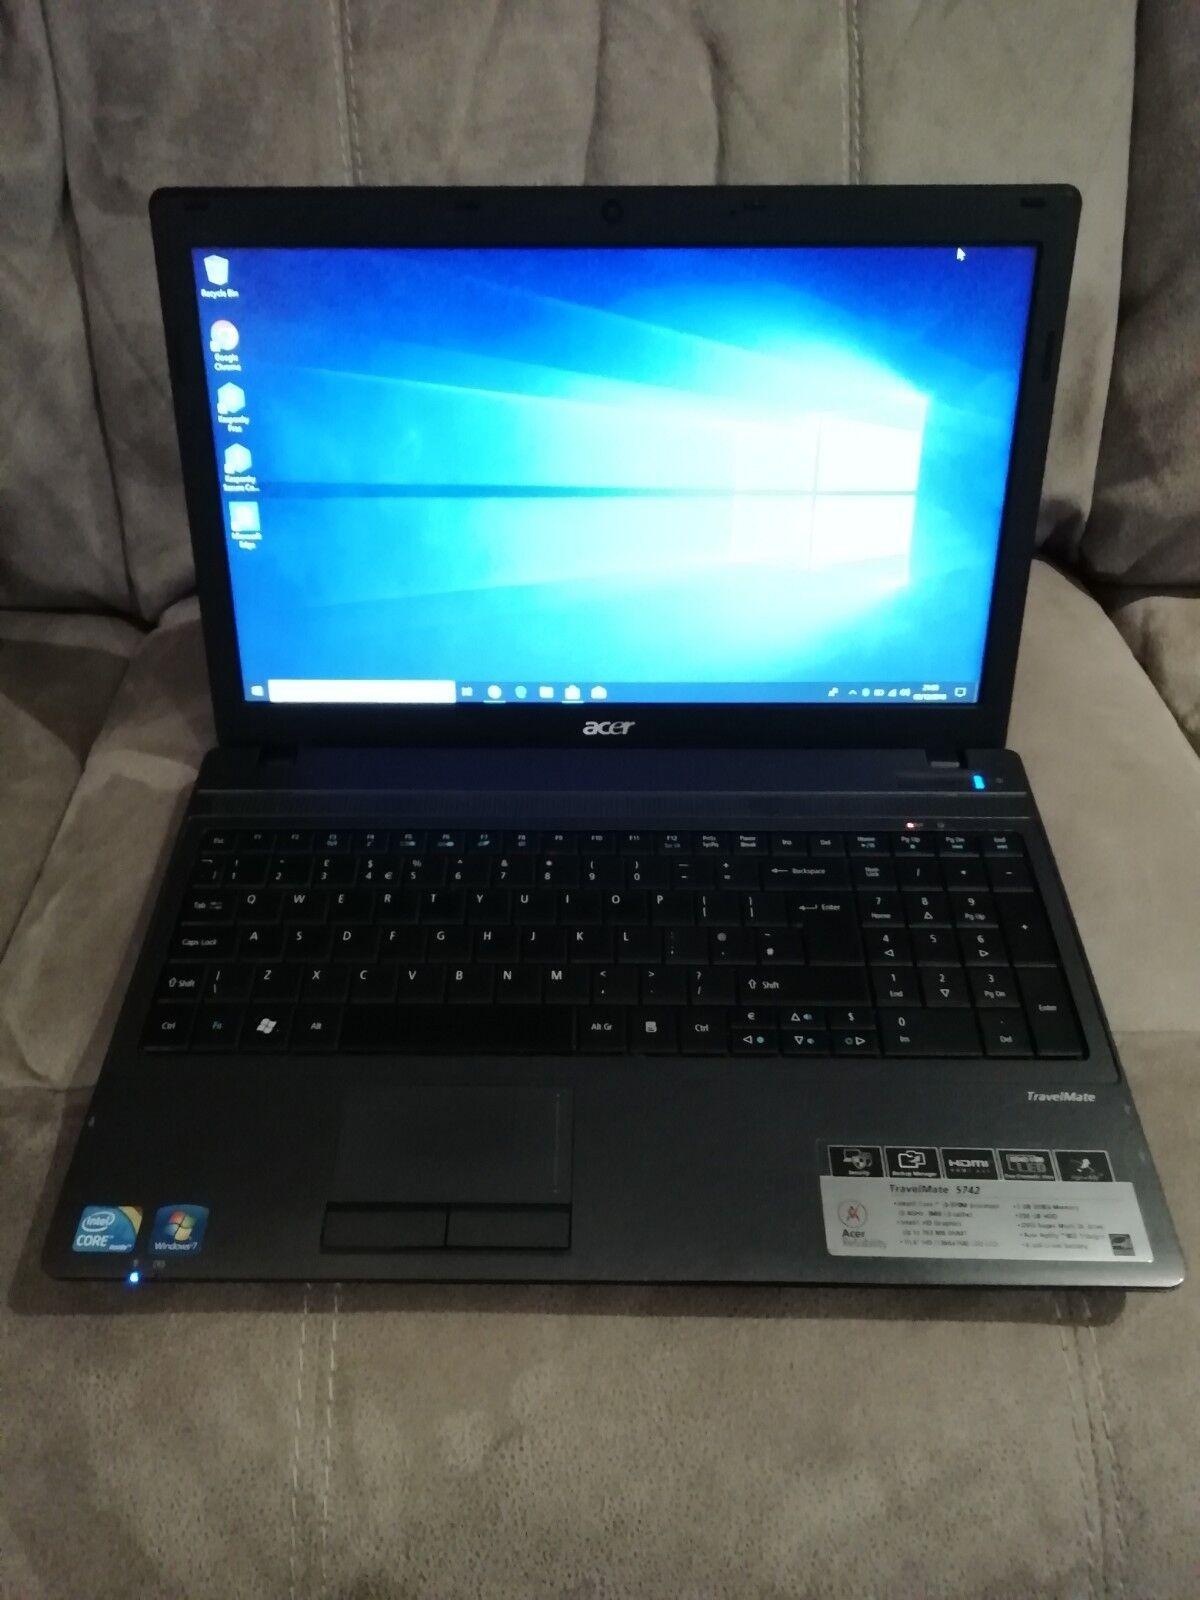 Laptop Windows - Acer Travel Mate 5742 Laptop Windows 10 - Intel i3 2.4GHz - 6GB RAM - 120GB SSD